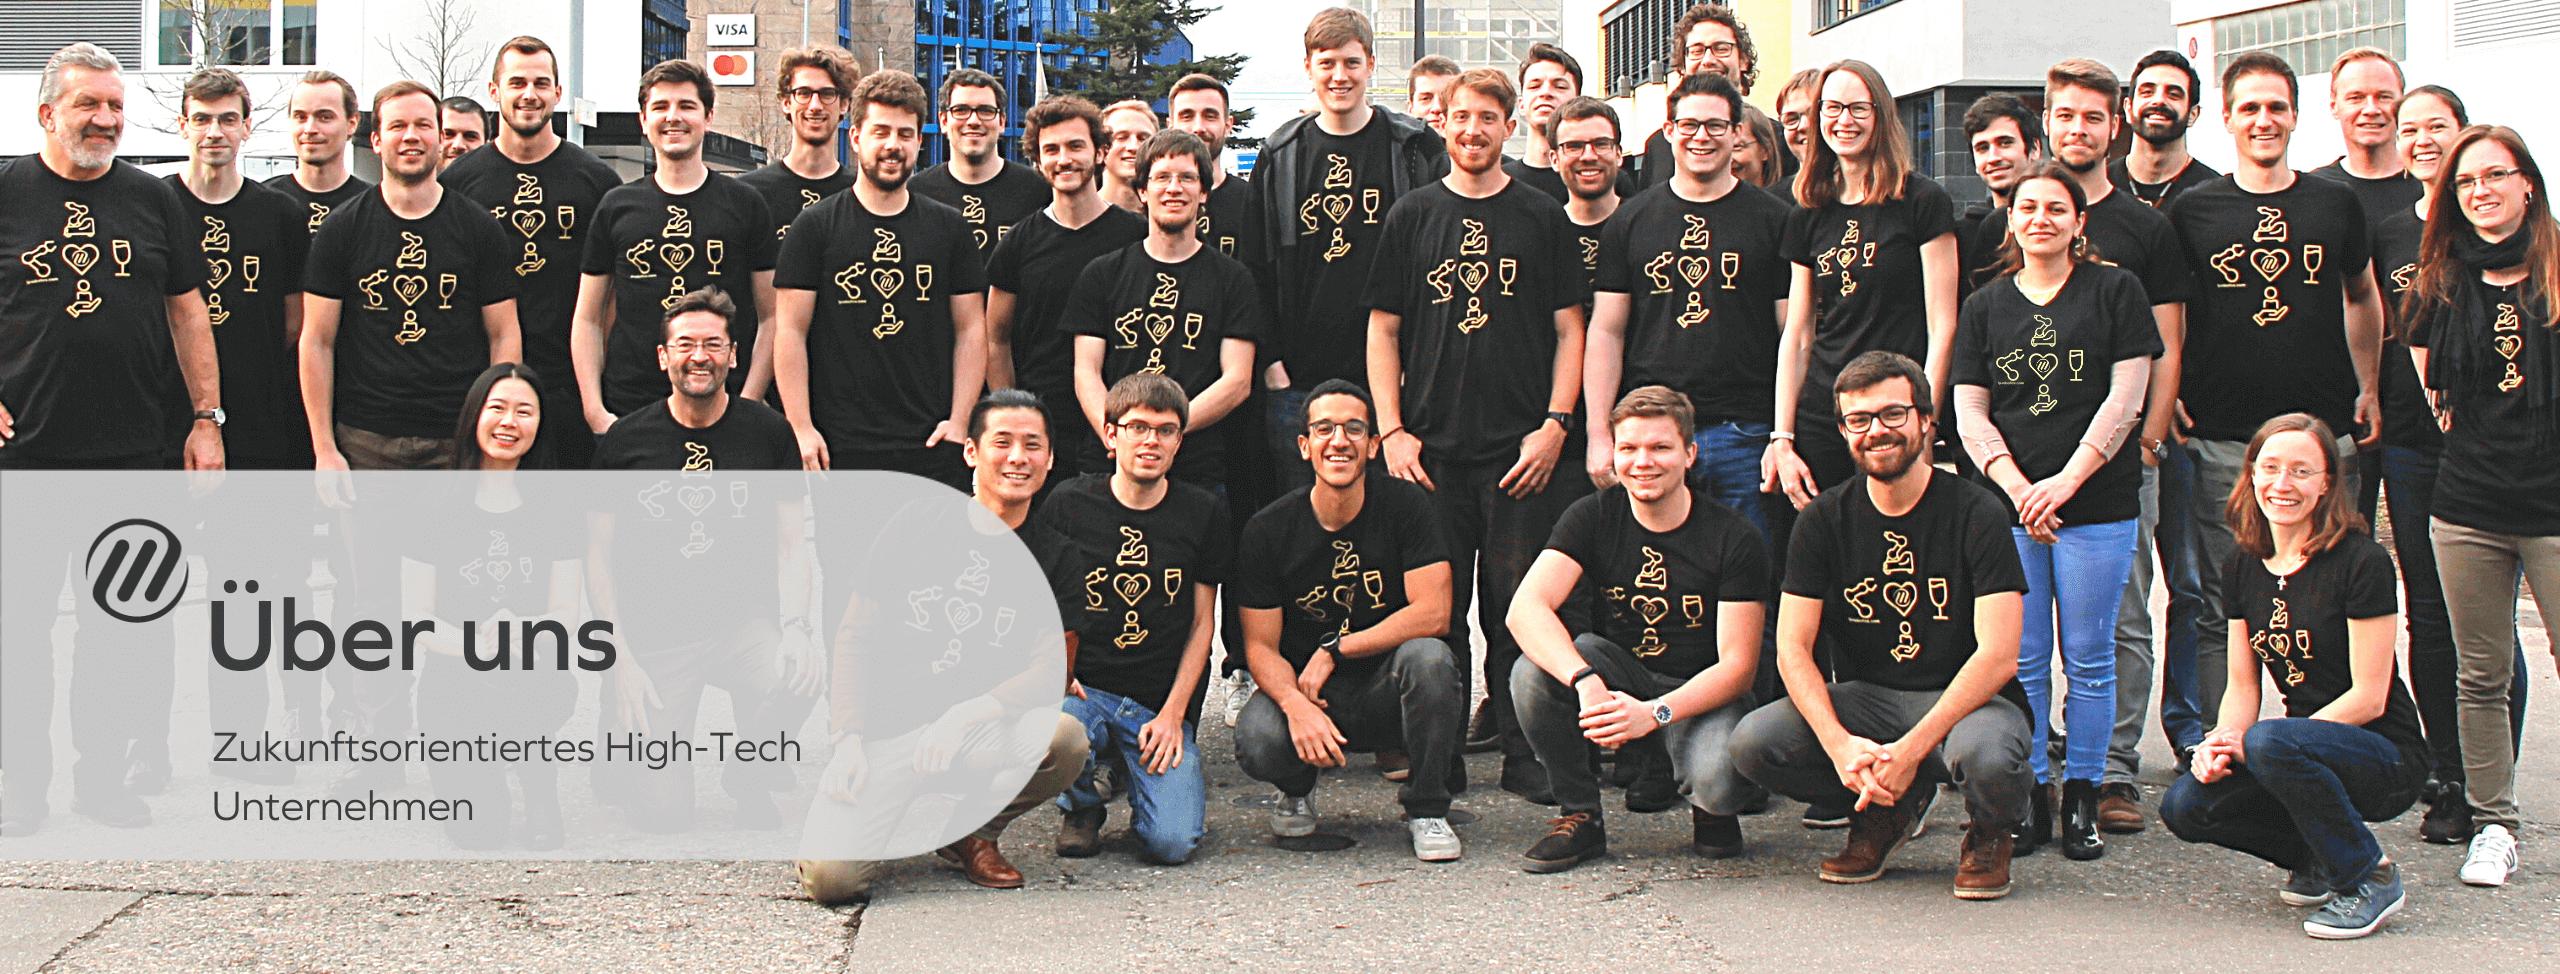 Future oriented high tech company F&P Robotics